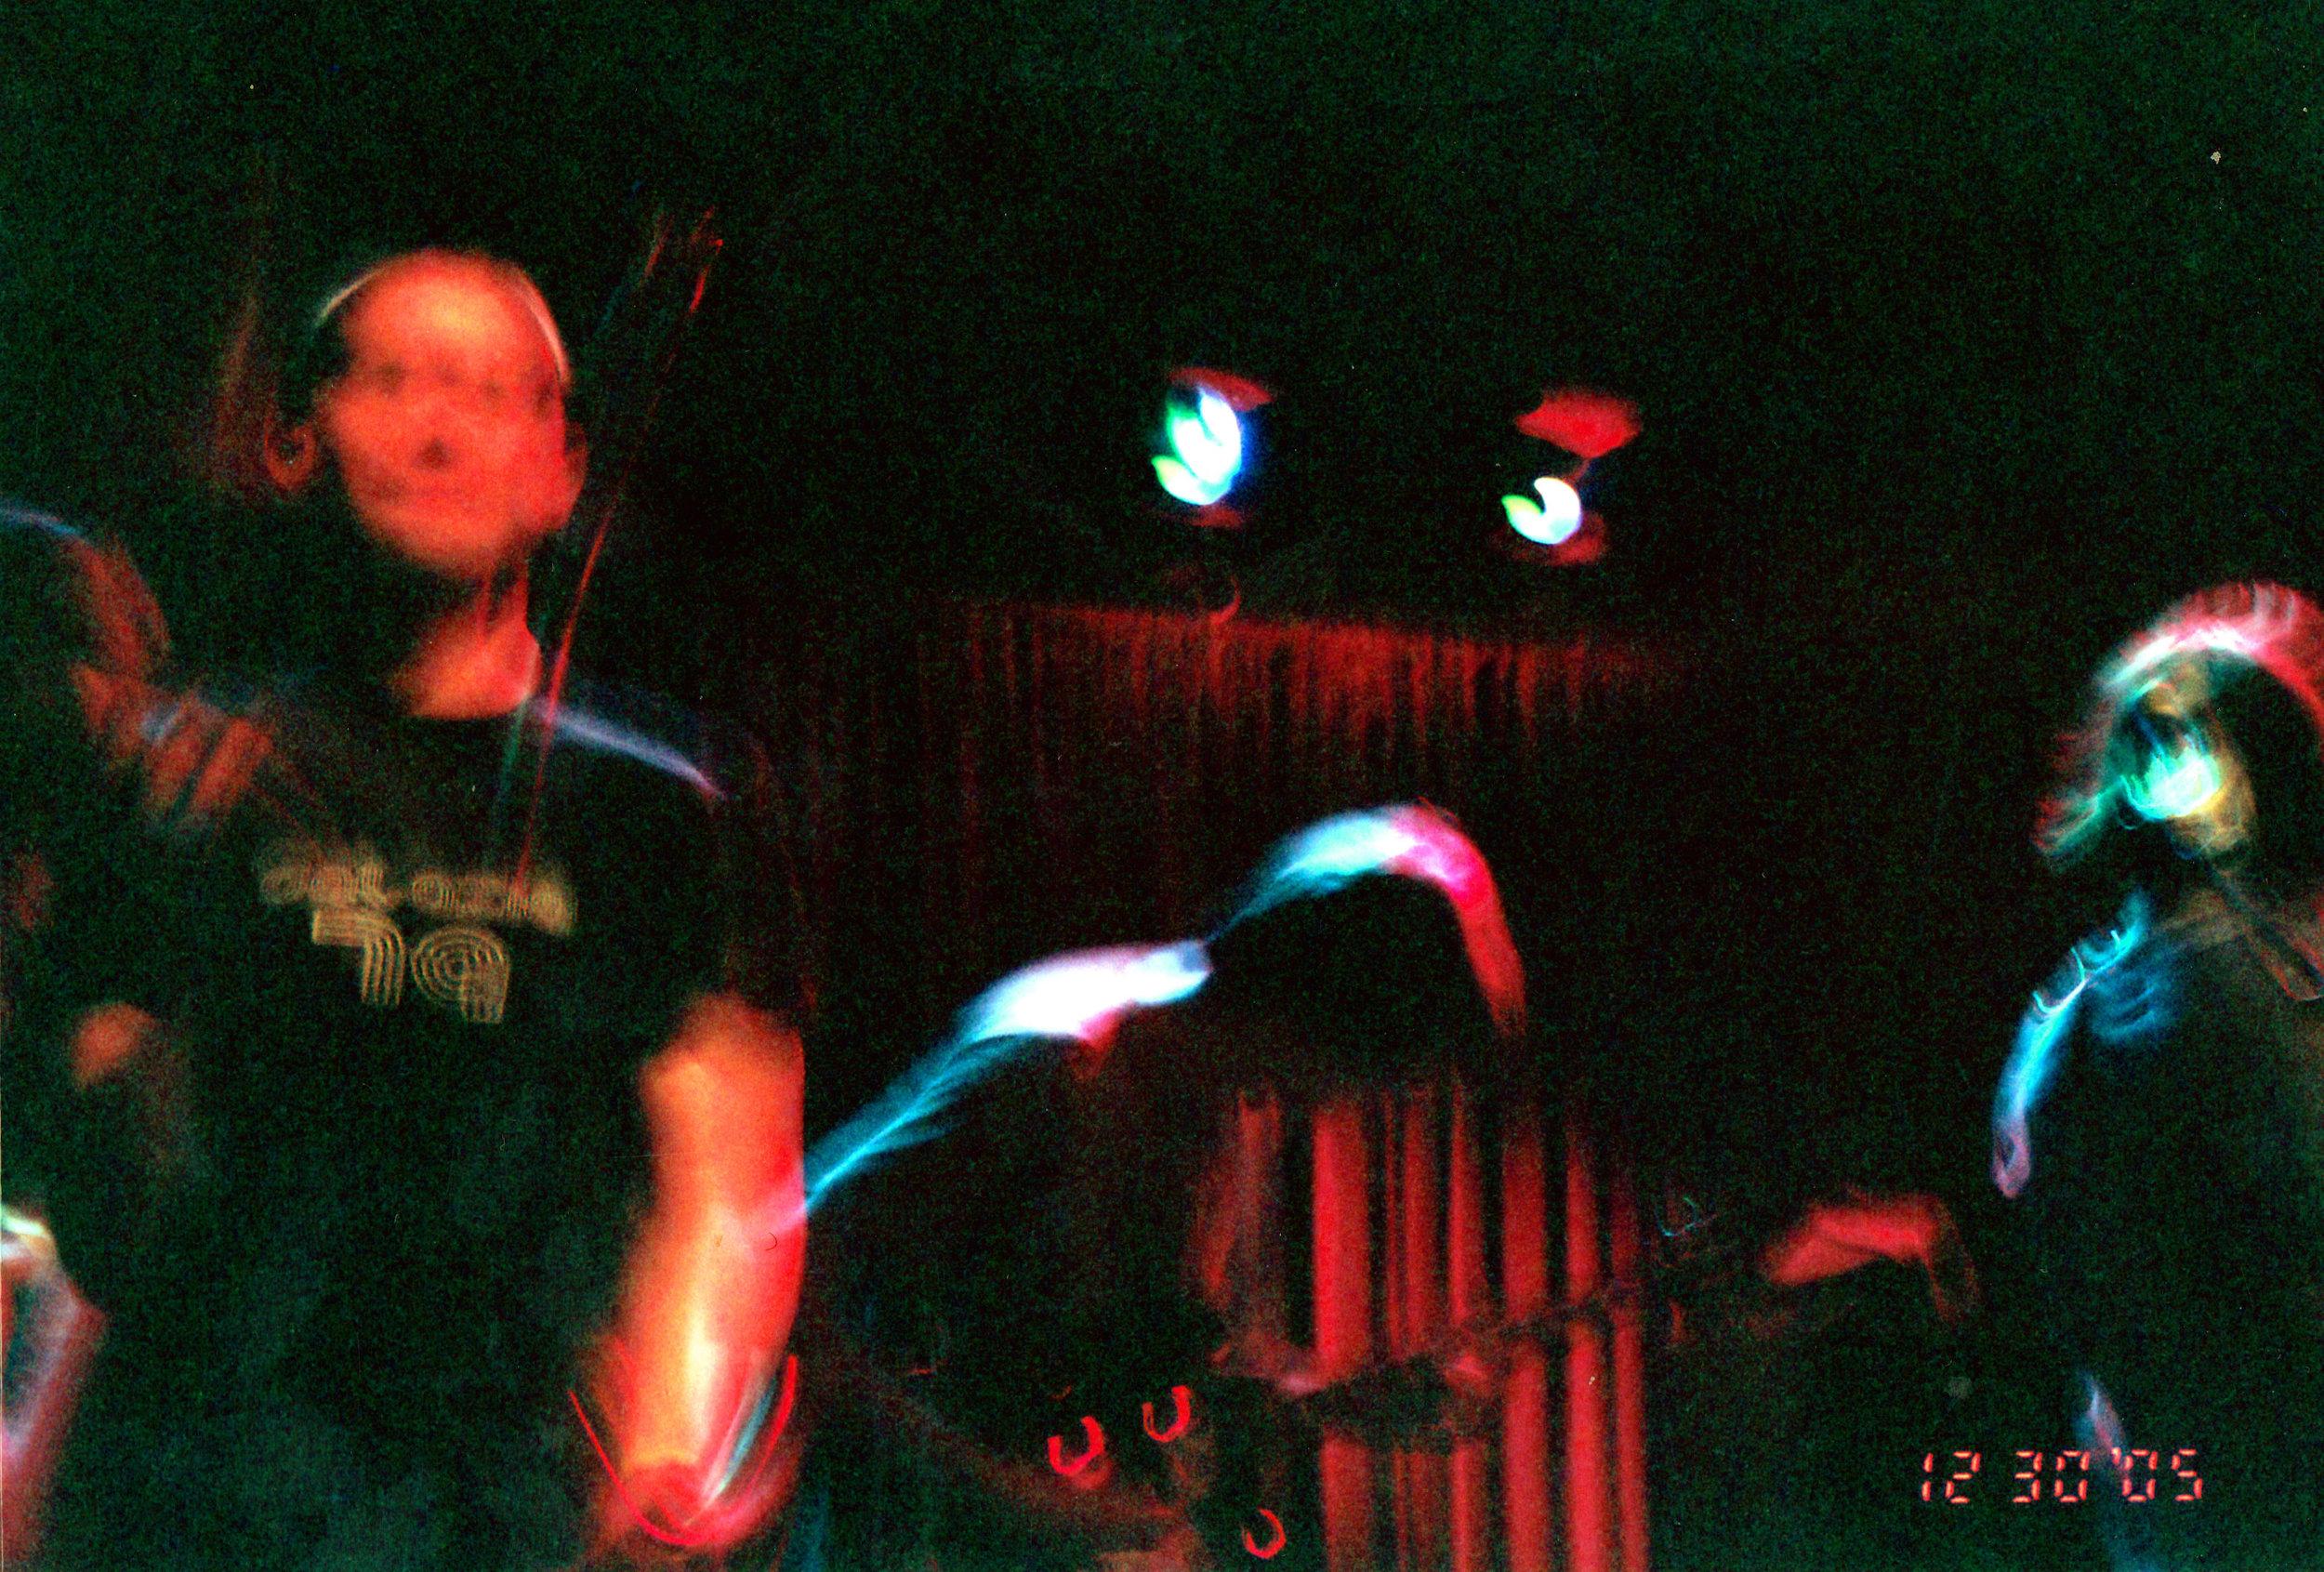 Sleater-Kinney - December 30, 2005 - Portland, OR, USA